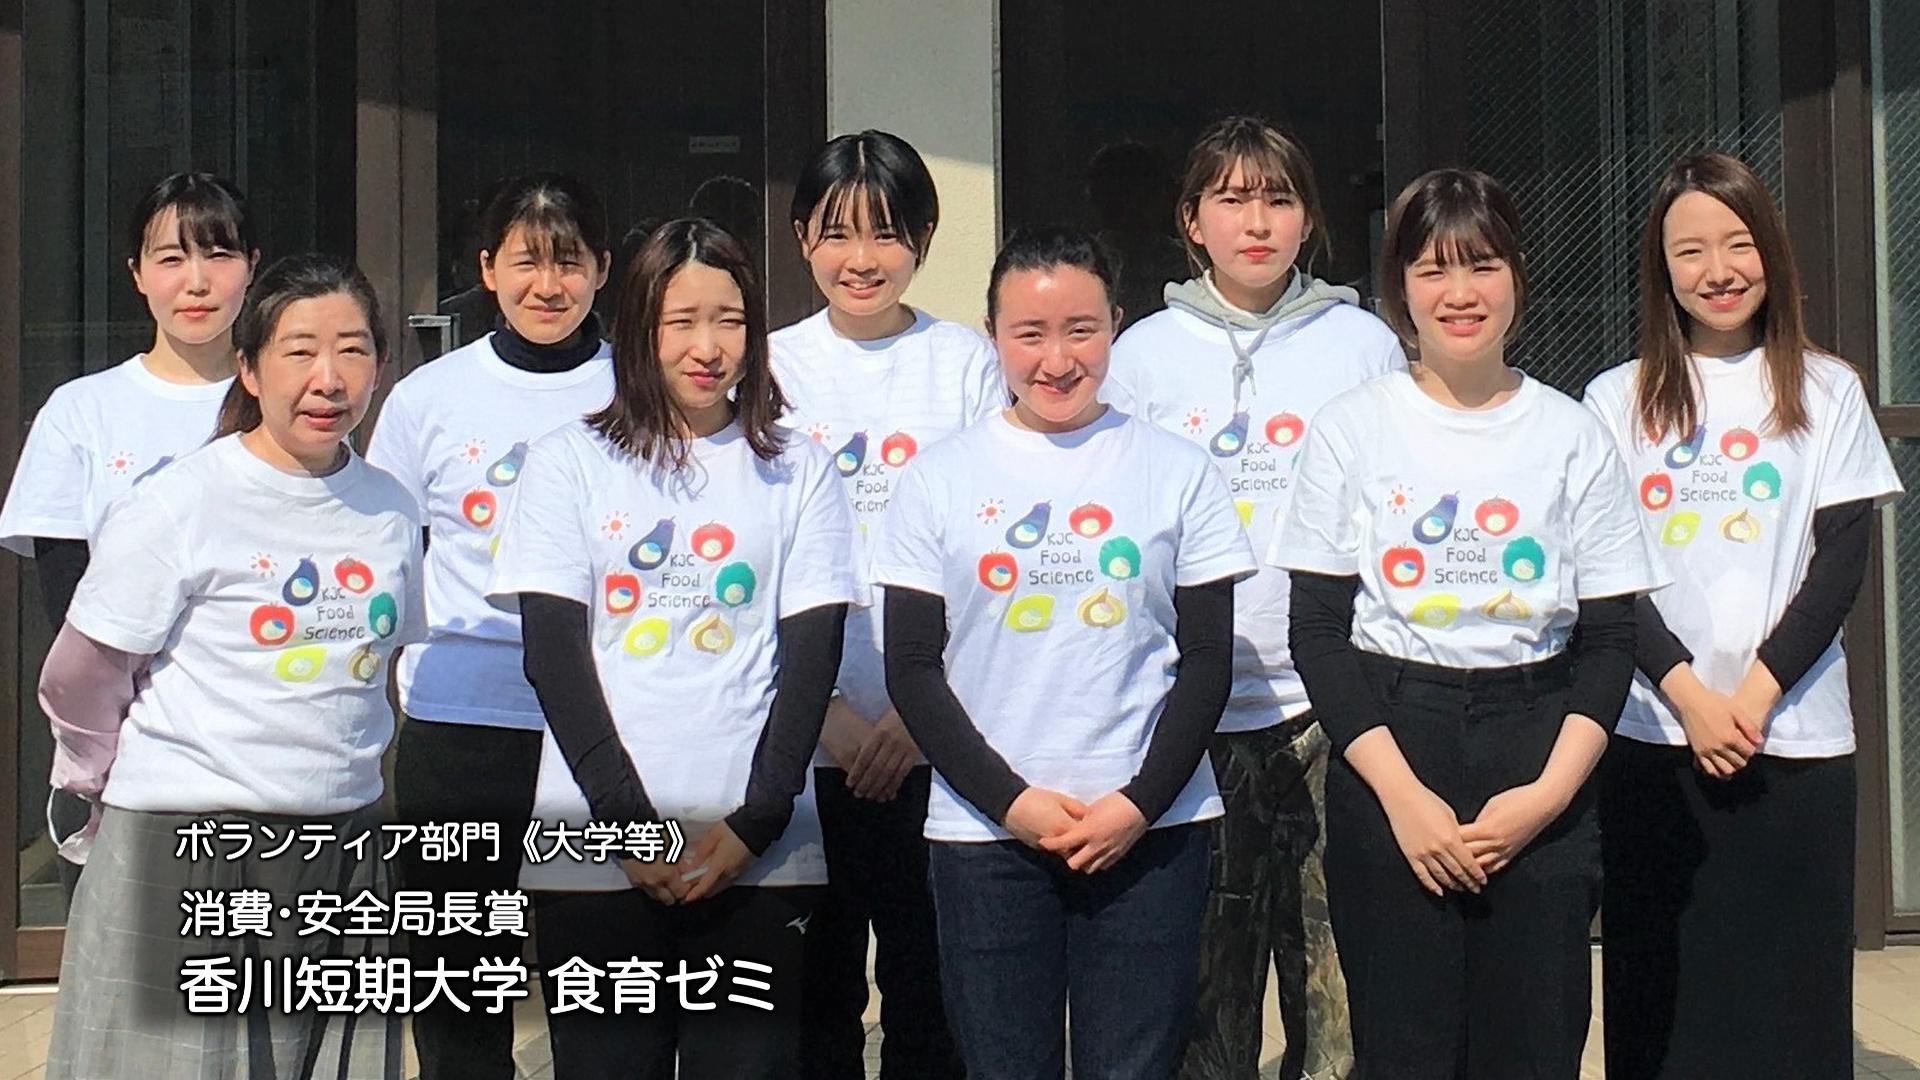 香川短期大学 食育ゼミ